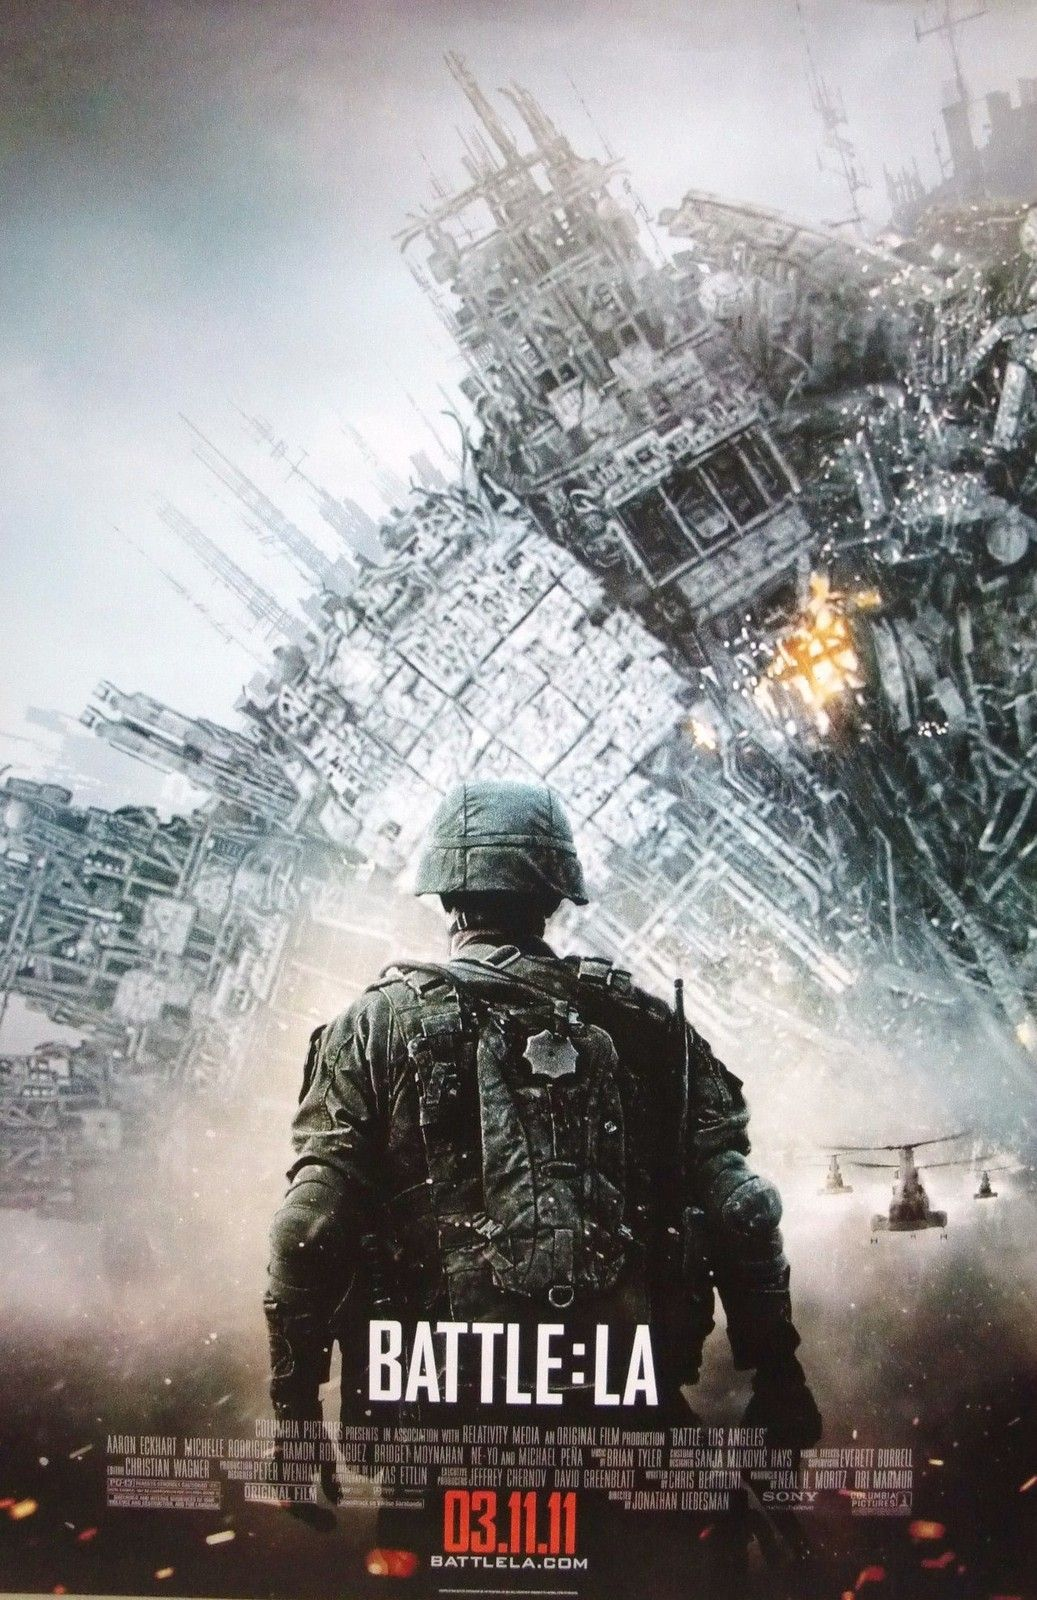 battle los angeles 2 full movie online free